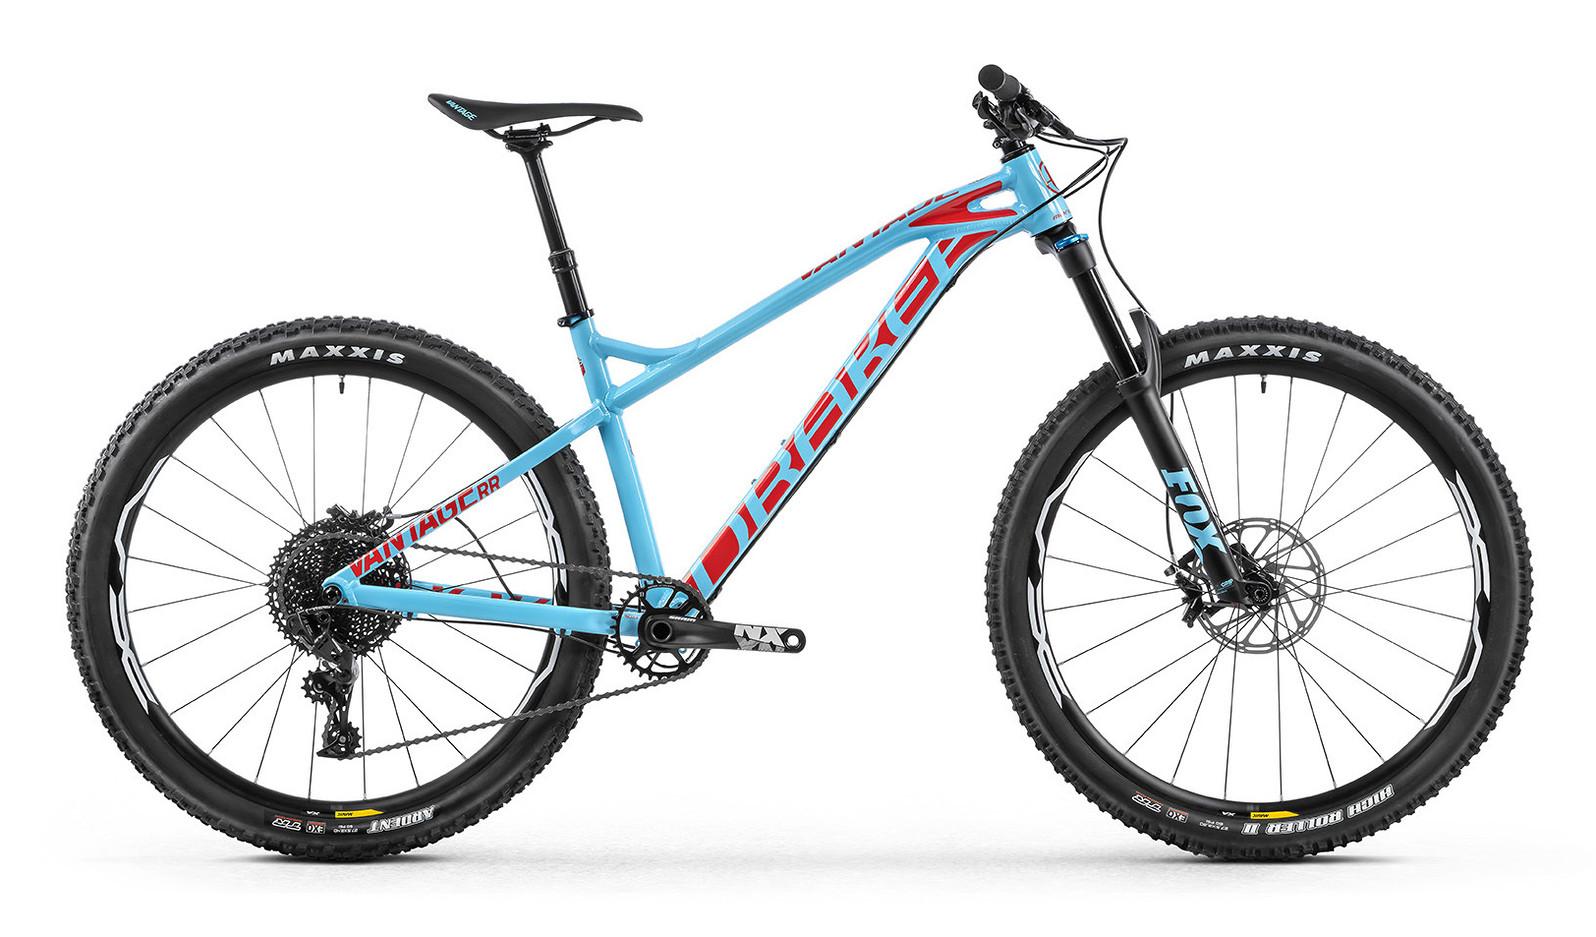 2018 Mondraker Vantage RR Bike 2018_Mondraker_Vantage_RR